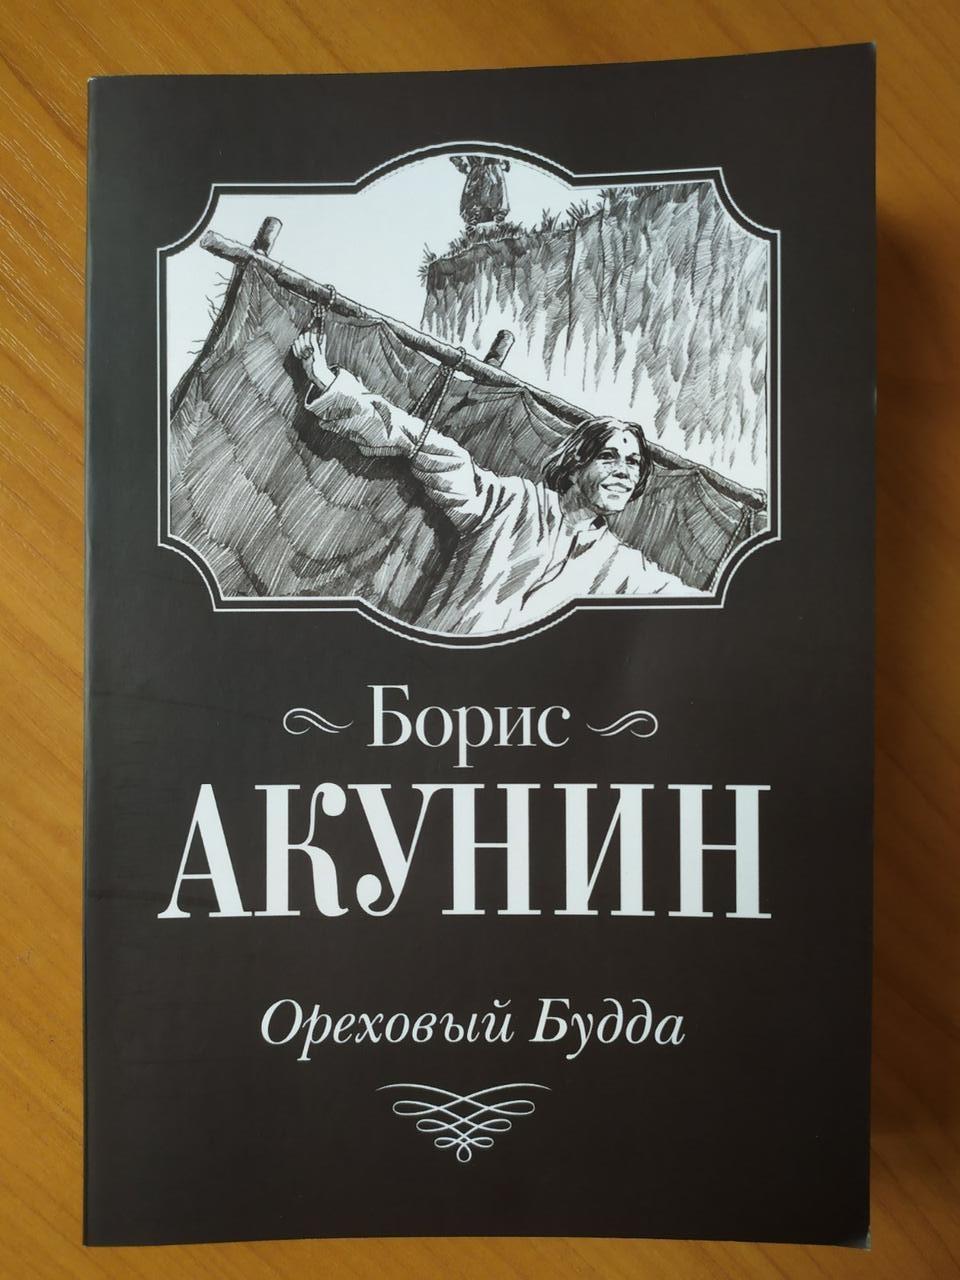 Борис Акунин. Ореховый Будда